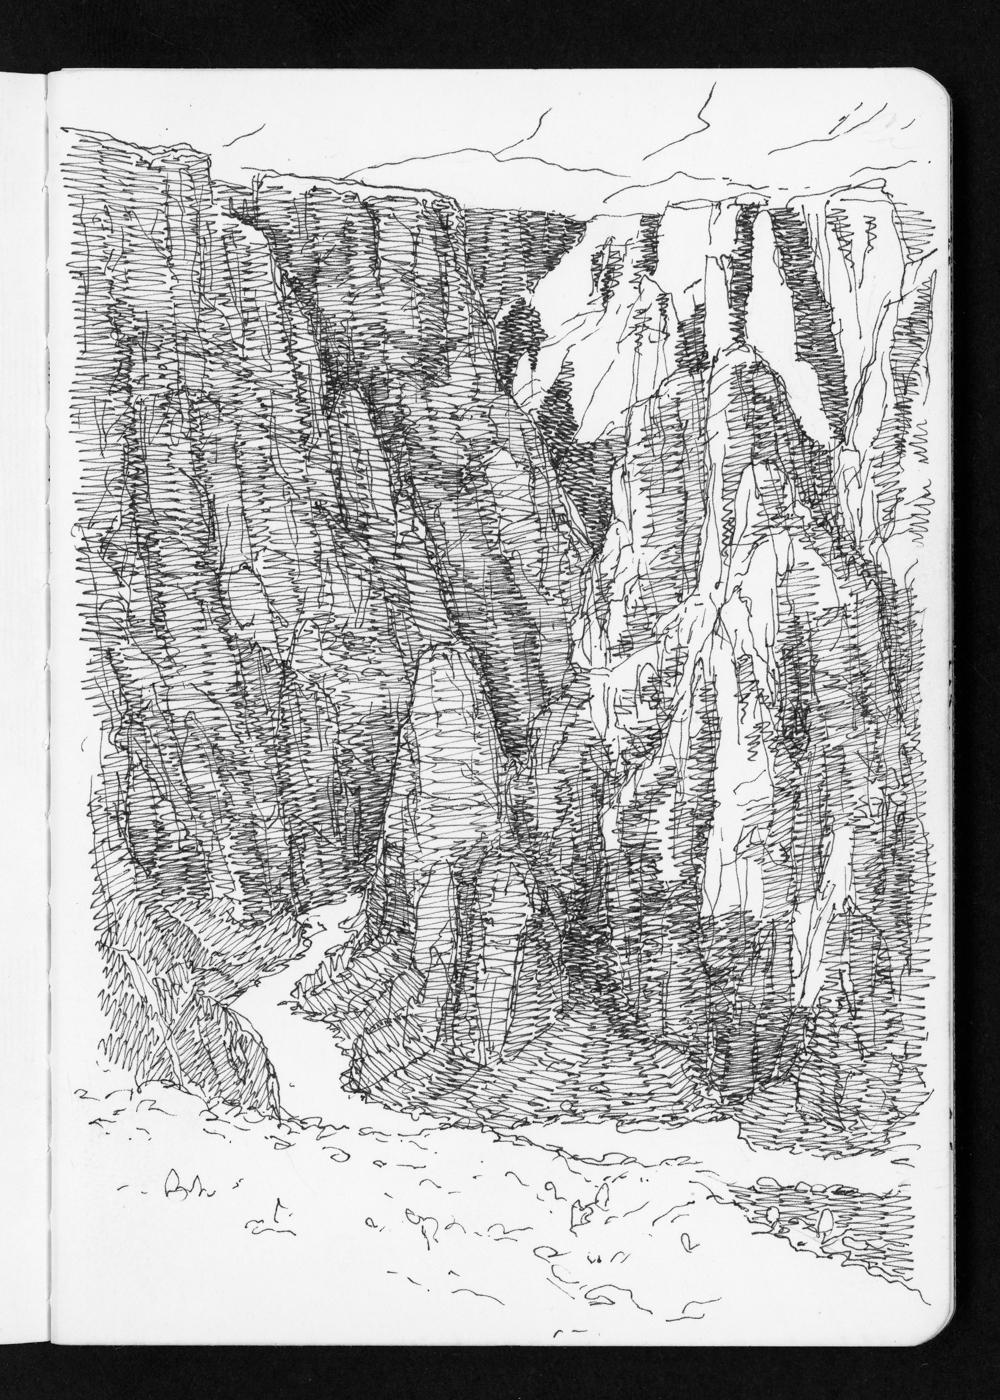 05-02 Black Canyon of the Gunnison.jpg